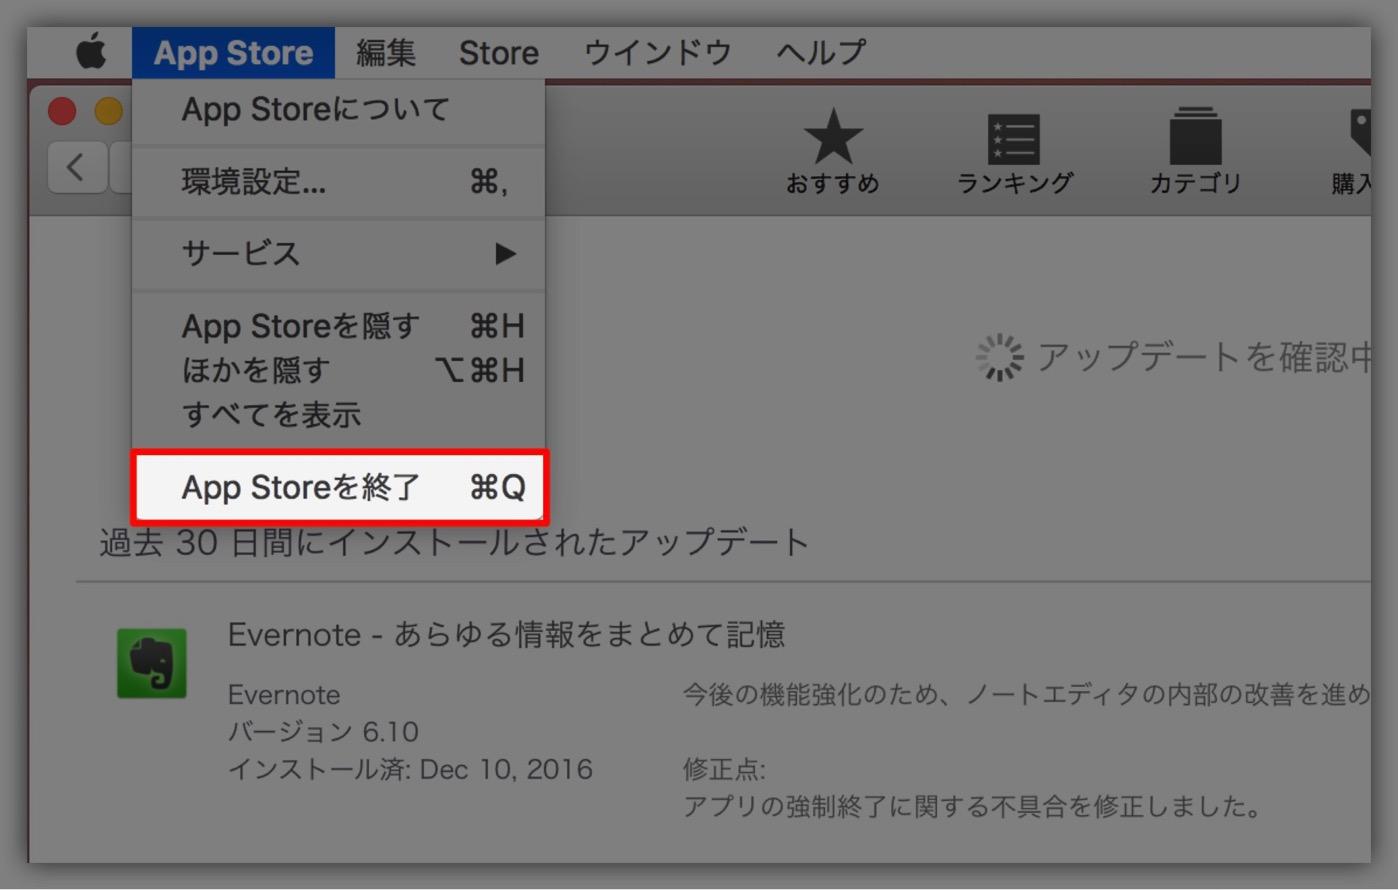 AppleStore-3